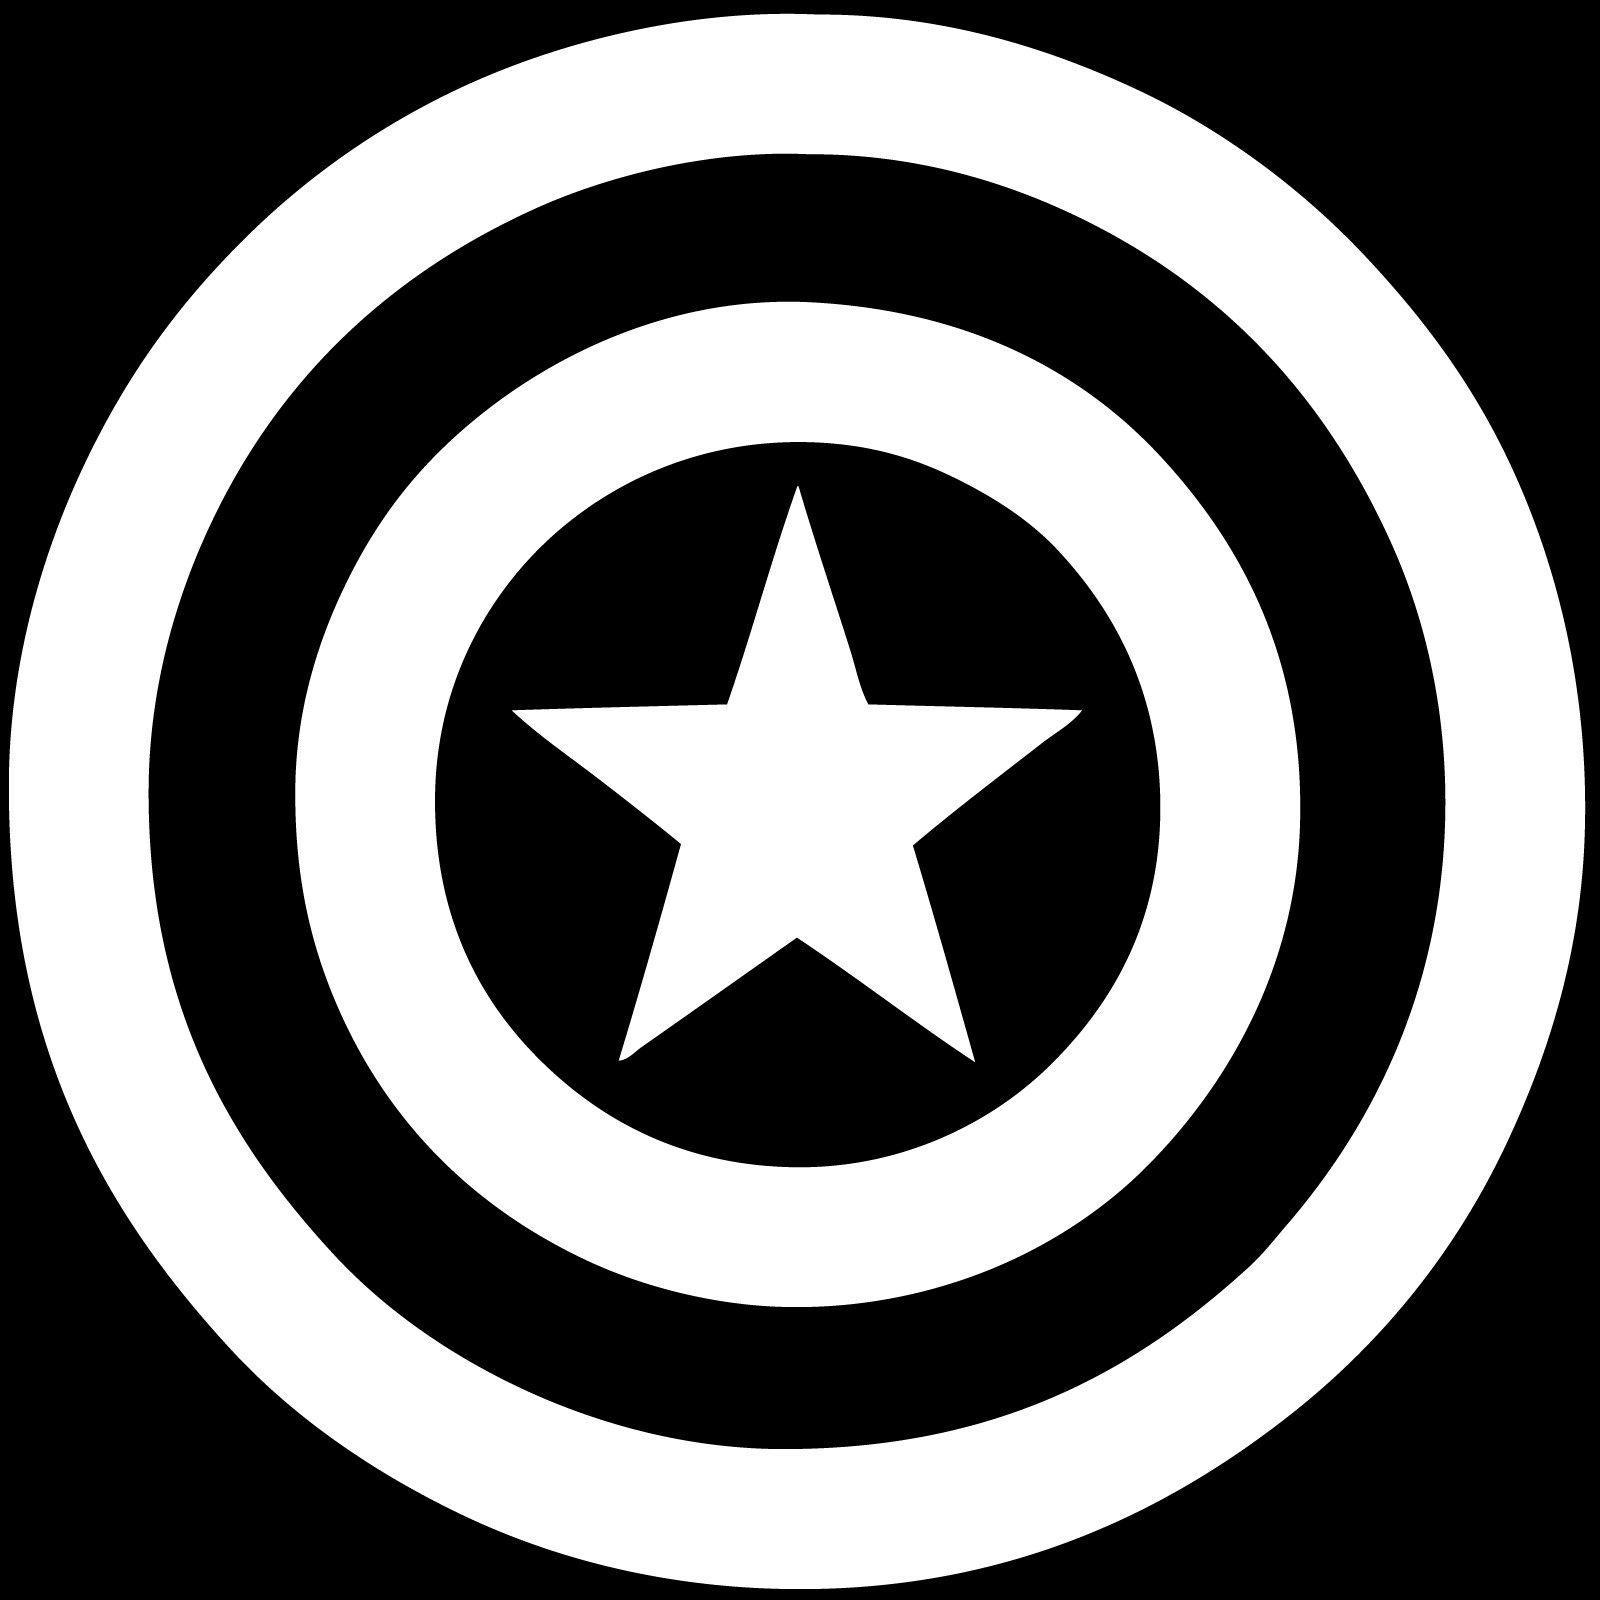 Captain Decal Sticker Car